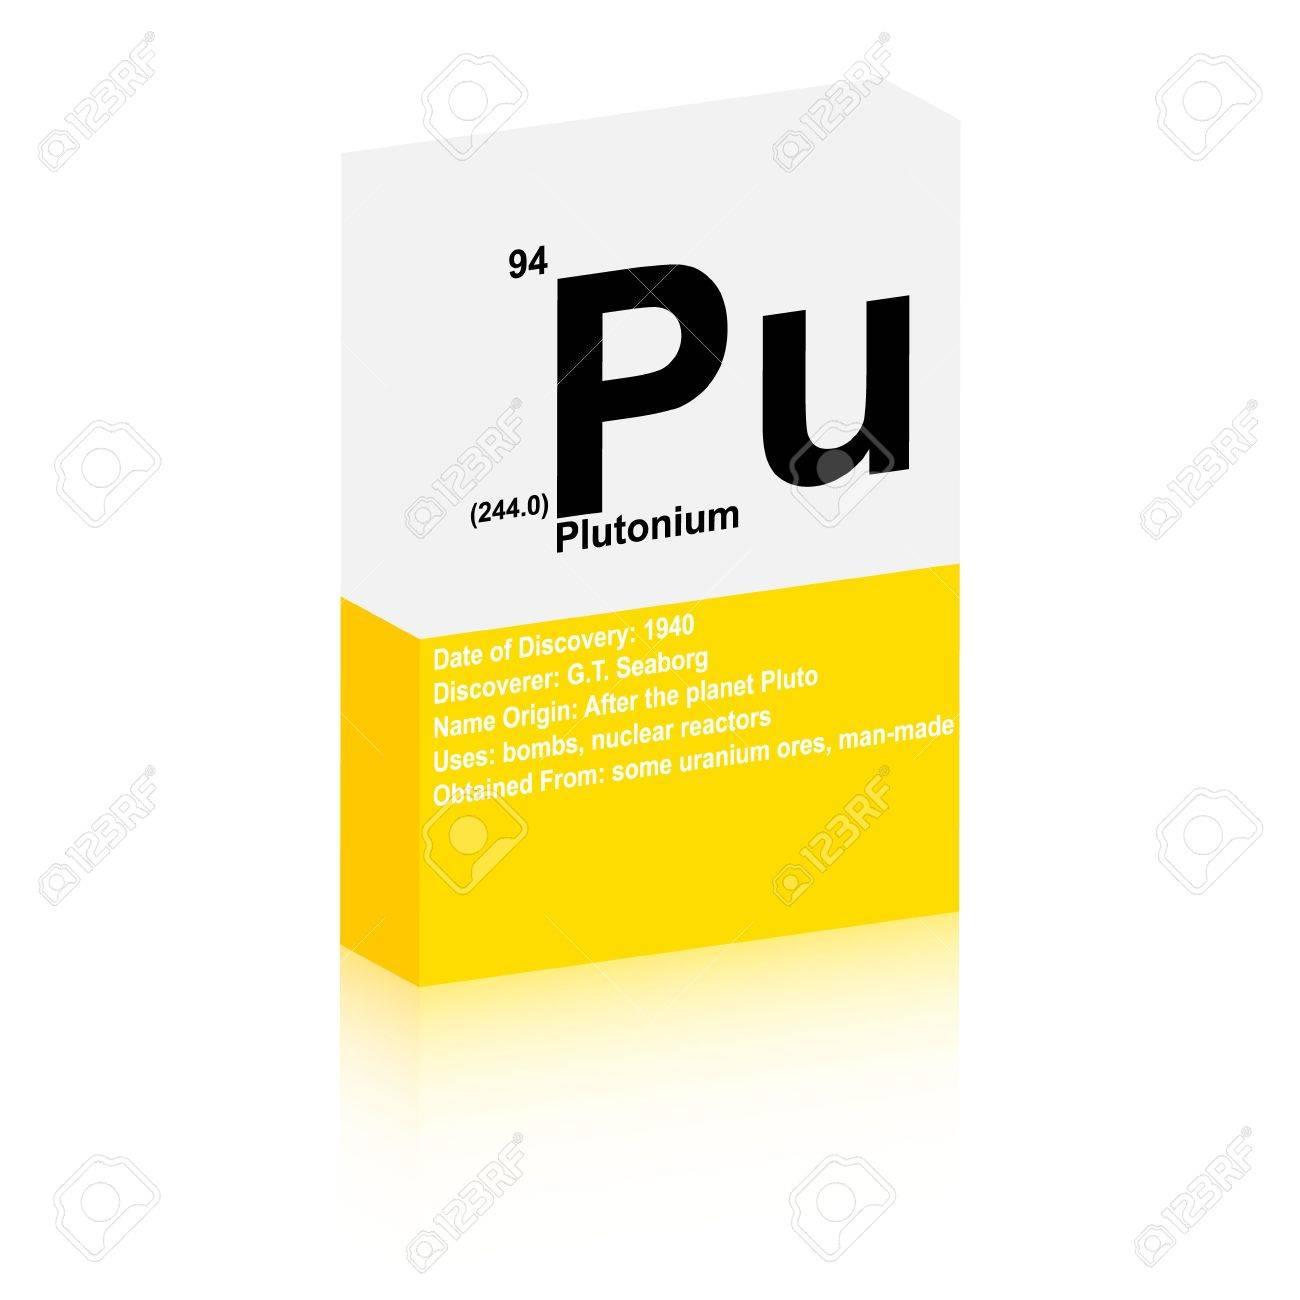 Plutonium symbol royalty free cliparts vectors and stock plutonium symbol stock vector 13345200 biocorpaavc Image collections